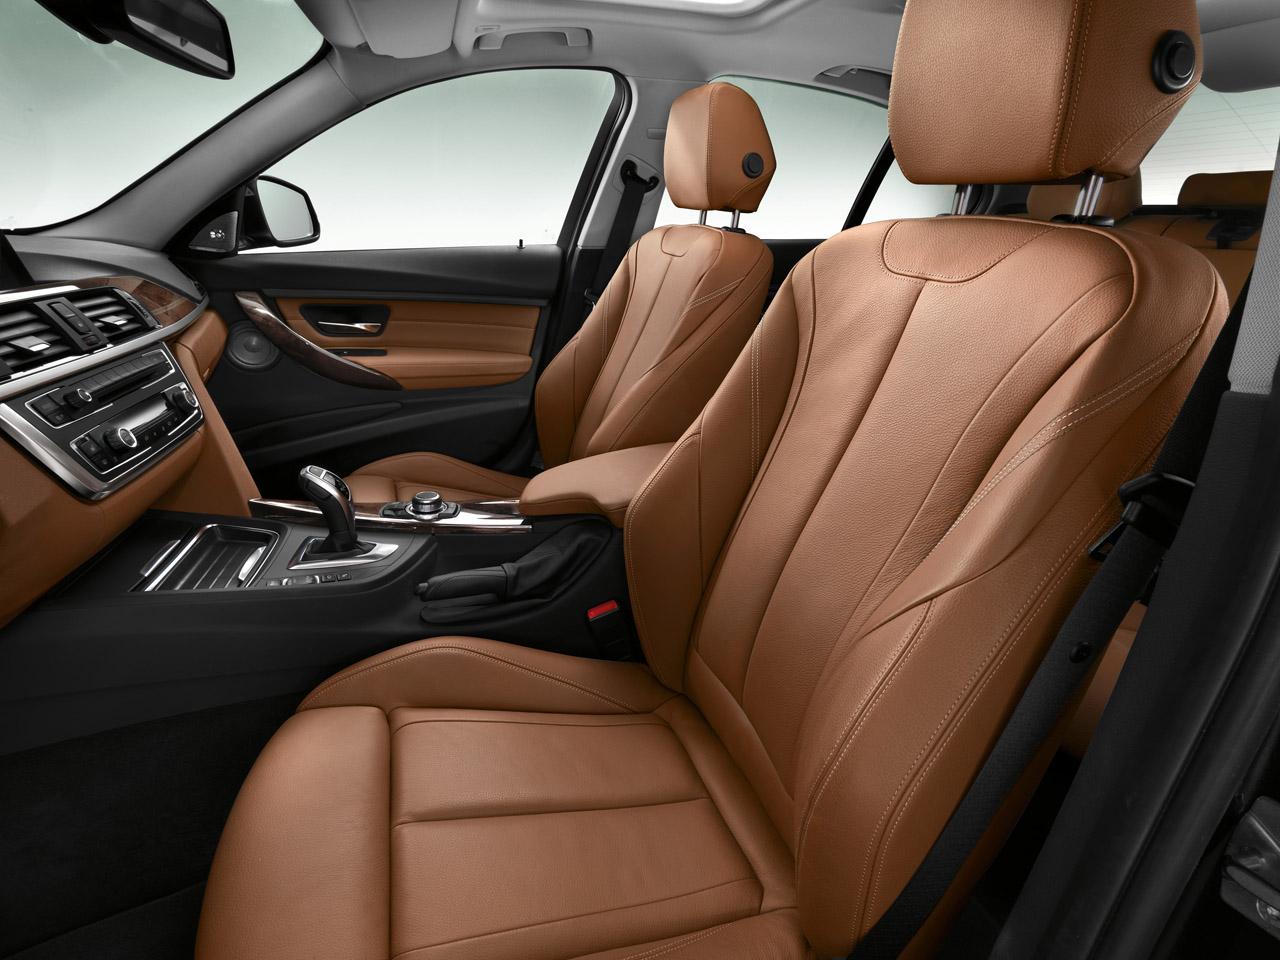 2012 BMW 3 Series F30 interior